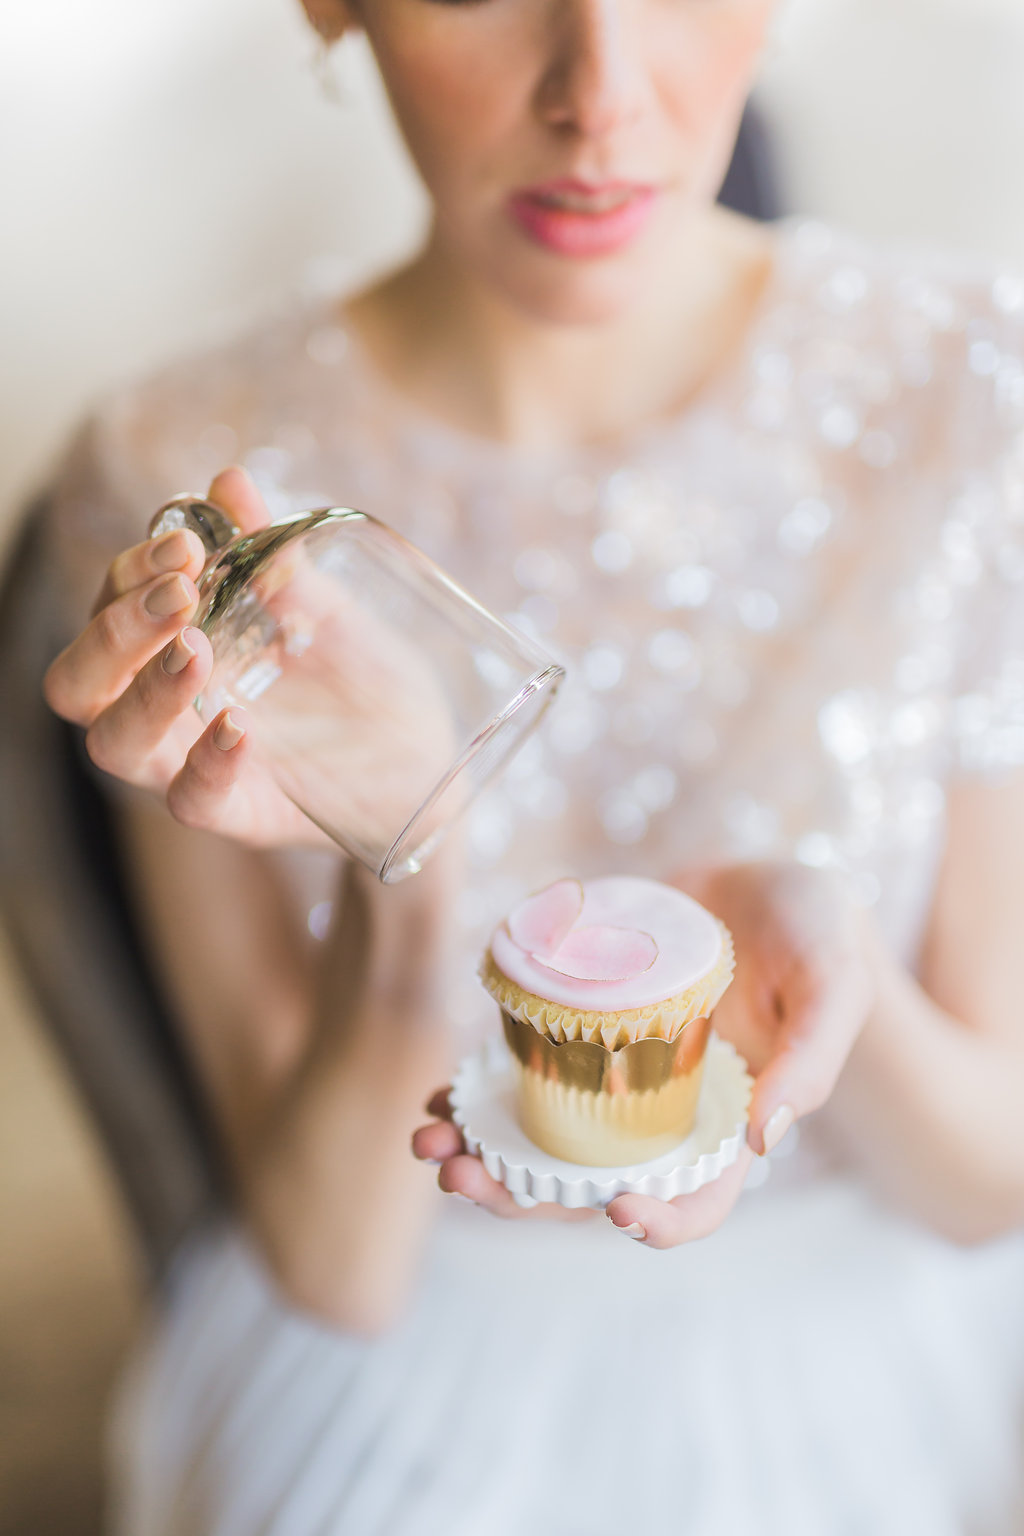 Storys_Building_Paper_Wedding_Inspiration_Photos-Rhythm_Photography-207.jpg